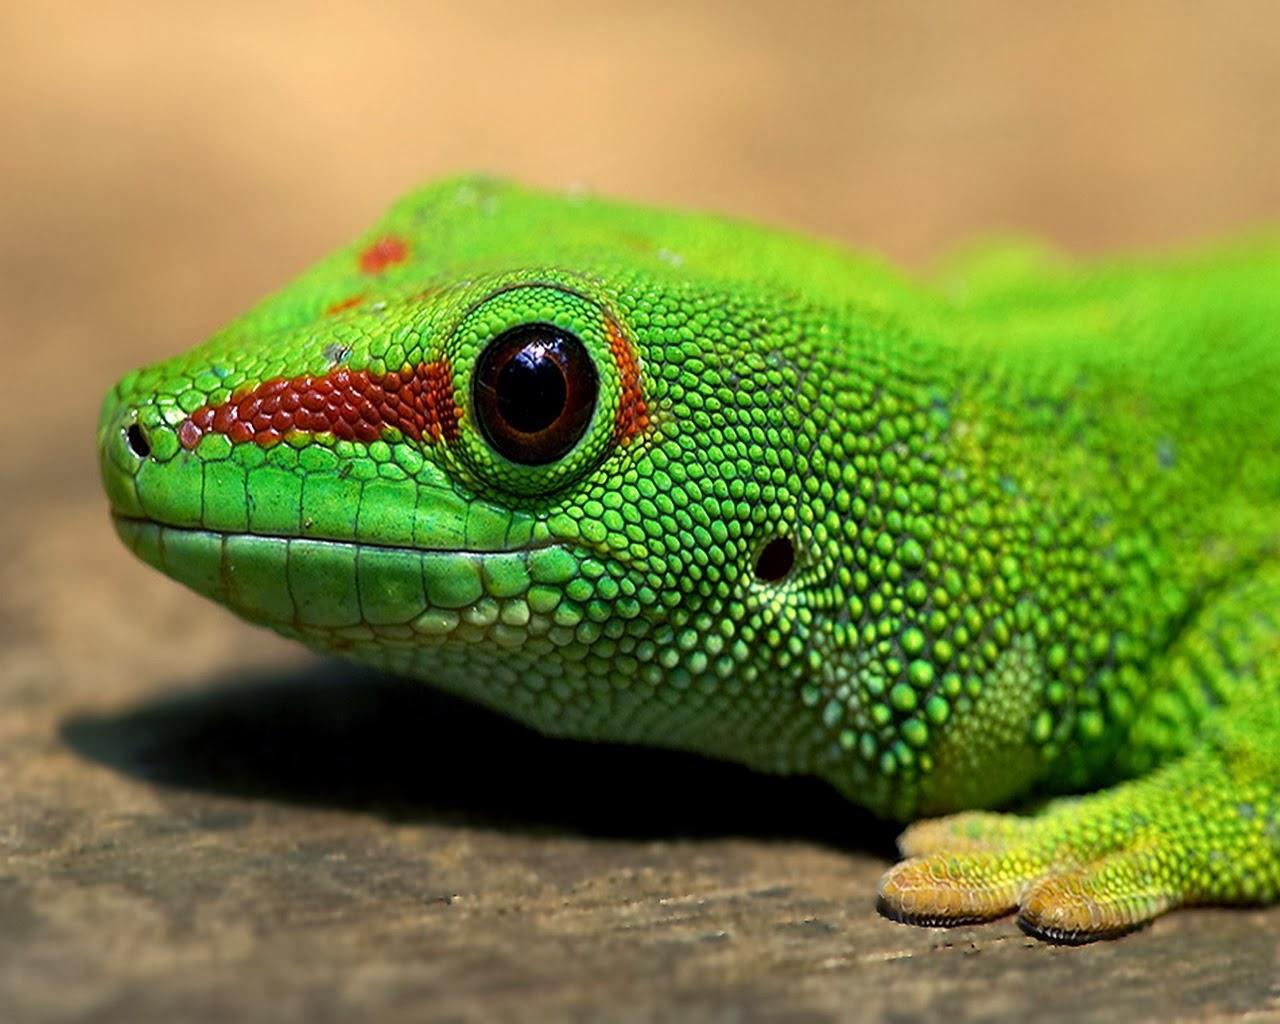 Gecko HD Wallpapers - HD Wallpapers Blog